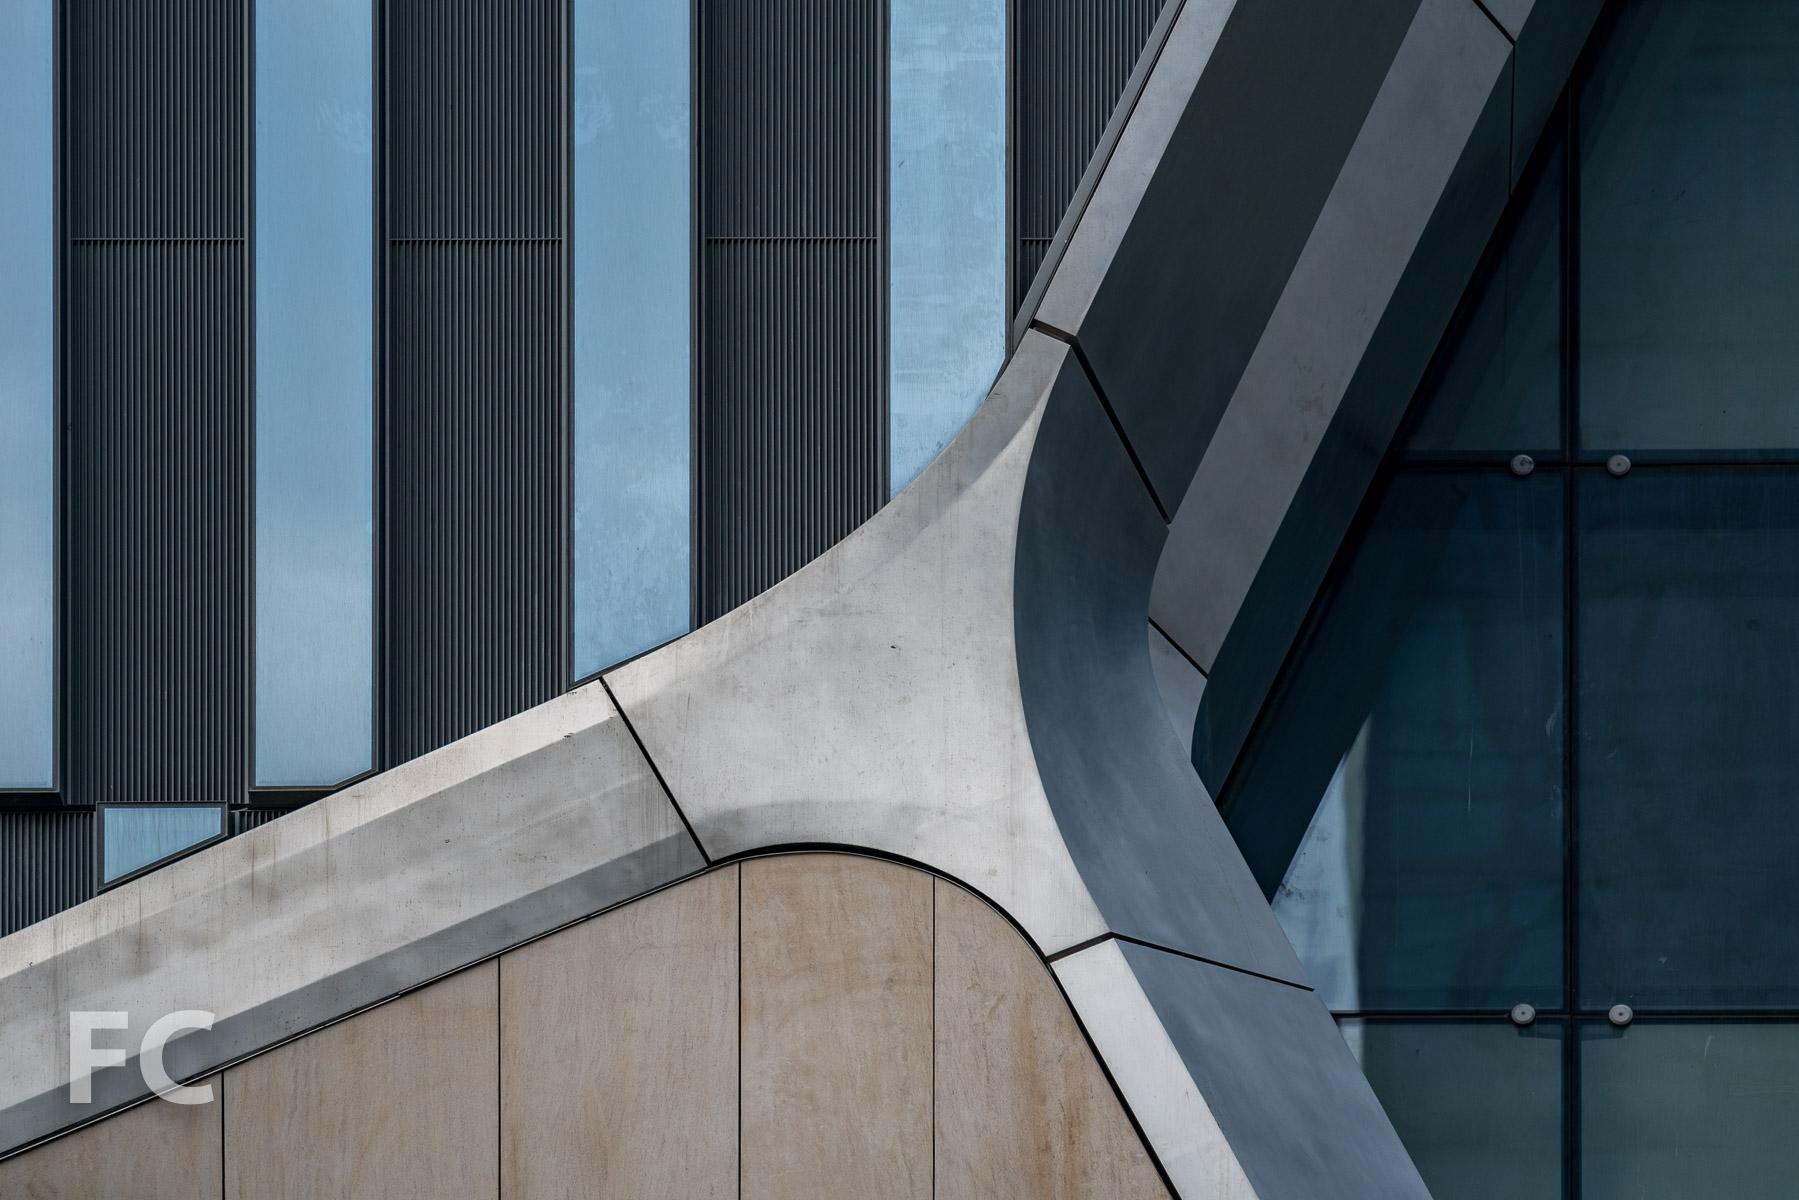 2019_02_02-Hudson Yards-DSC00190.jpg